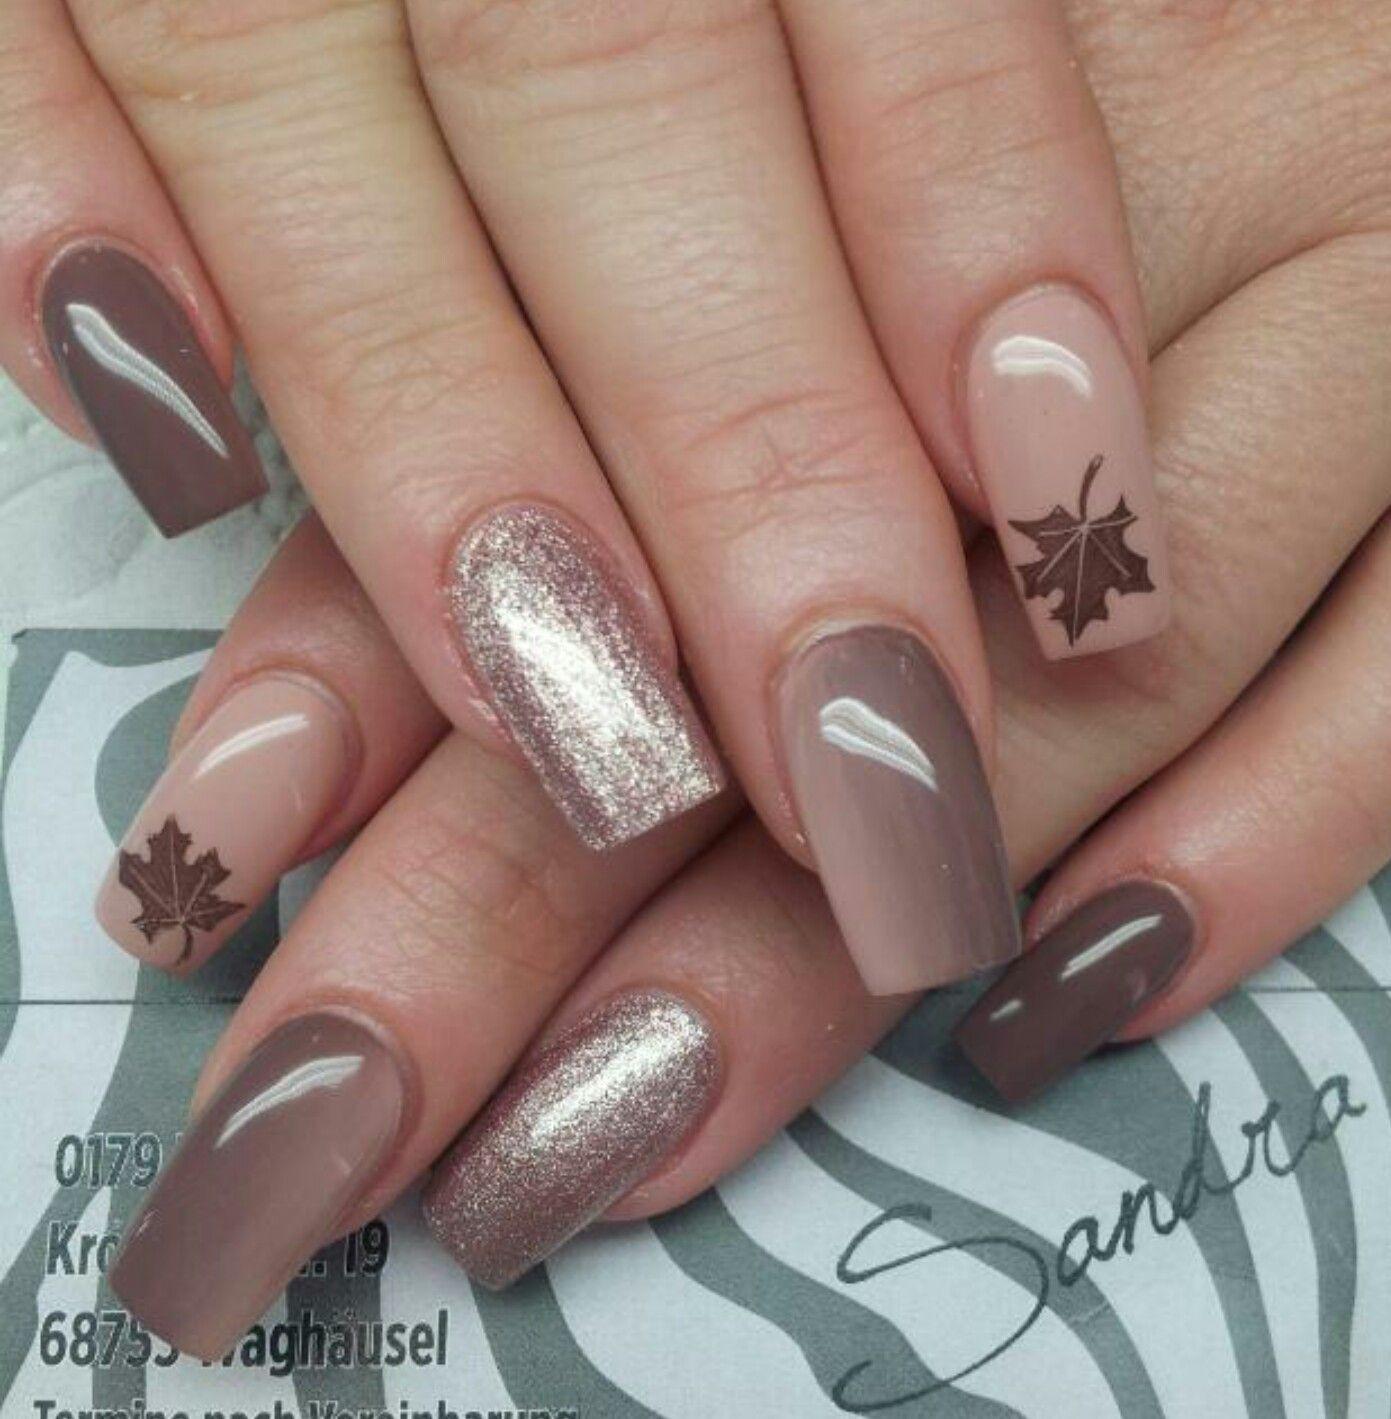 Nageldesign Braun  Nude Braun Herbst Nägel Pinterest